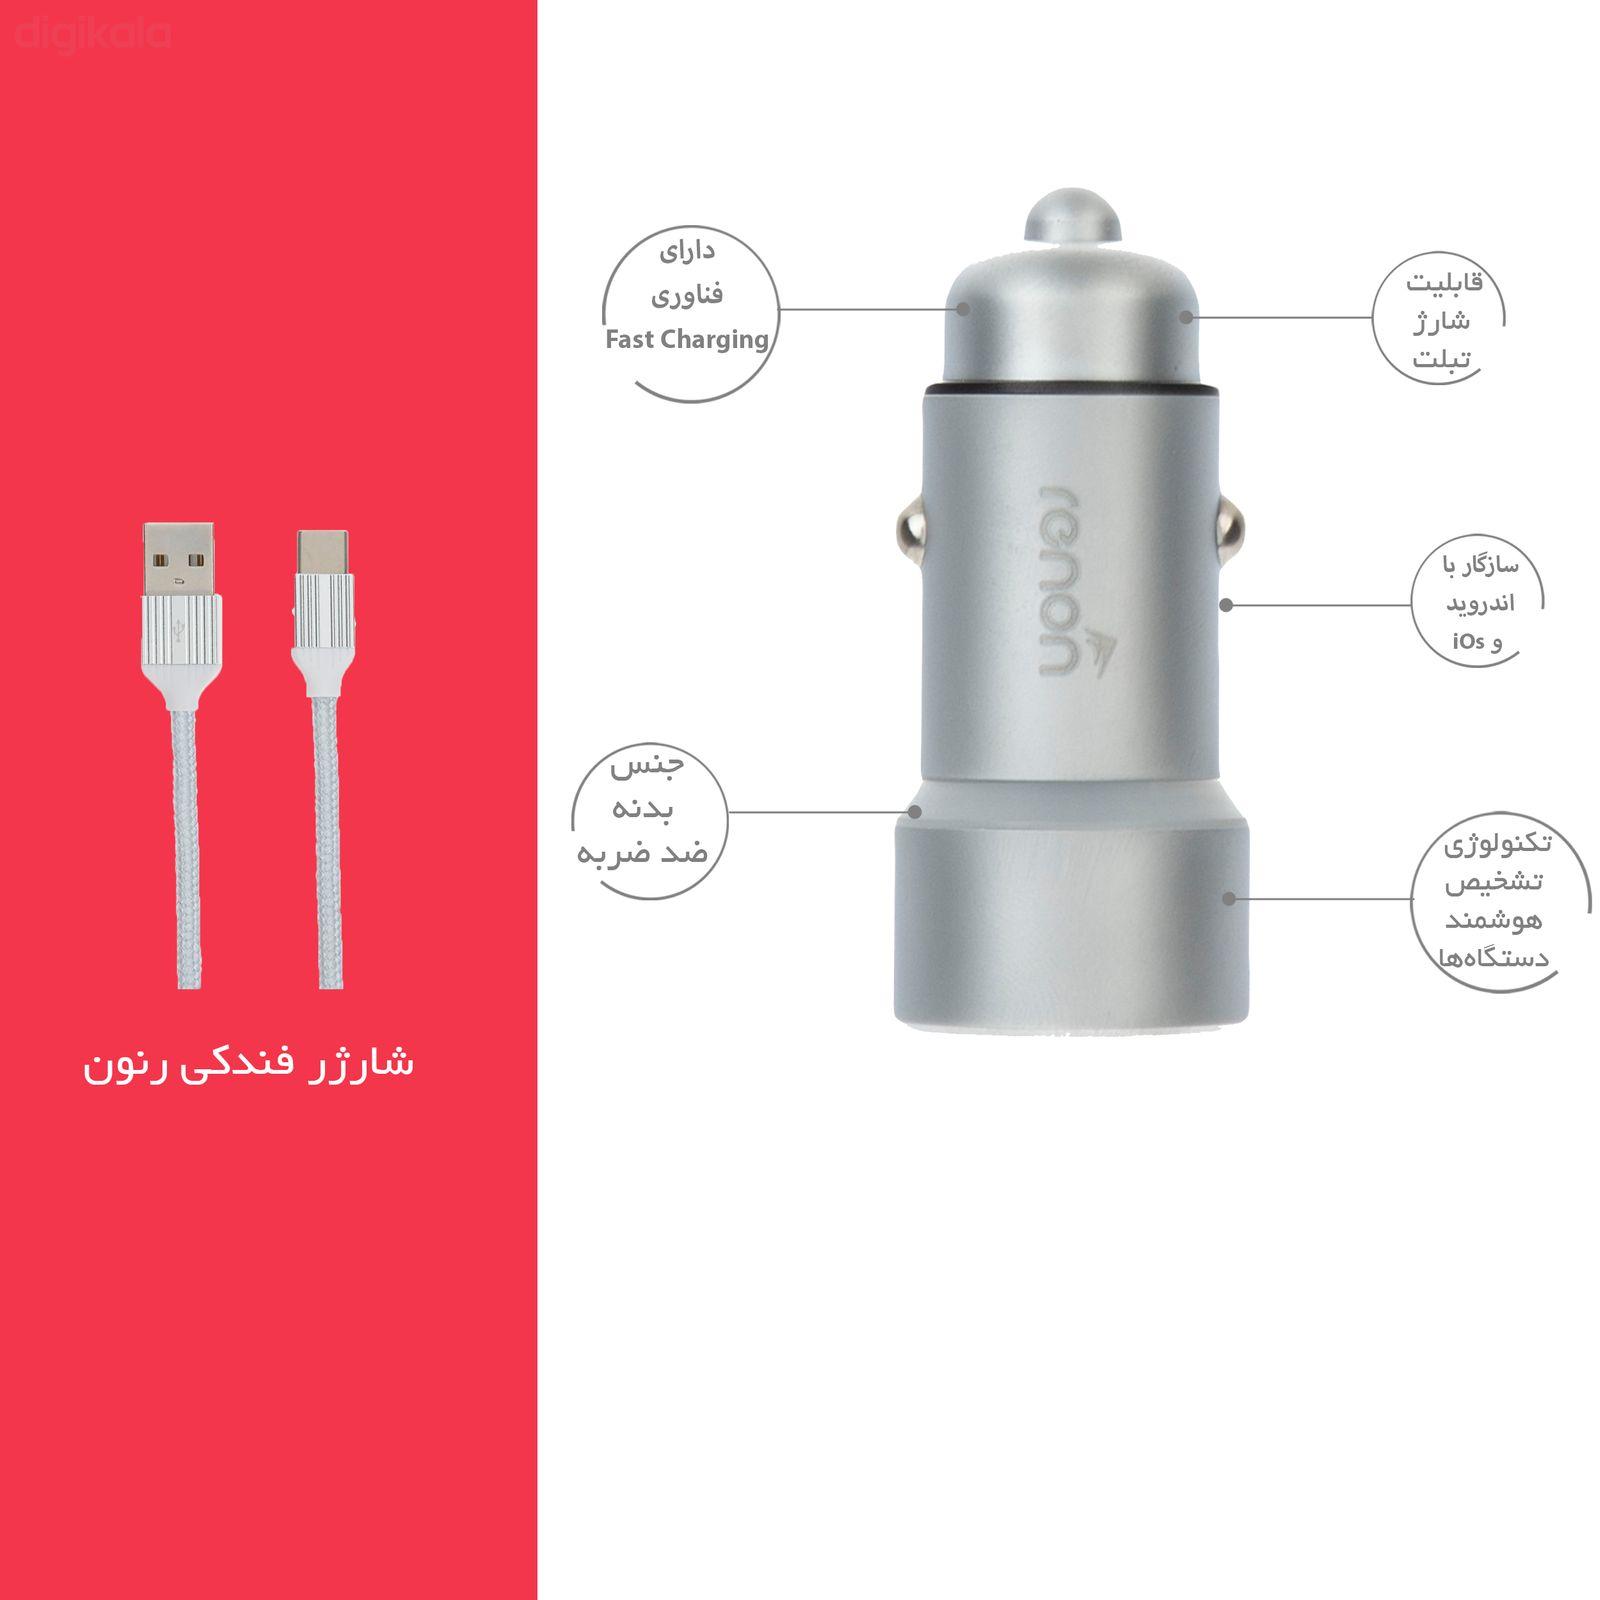 شارژر فندکی رنون مدل RN 181 به همراه کابل تبدیل USB-C main 1 13